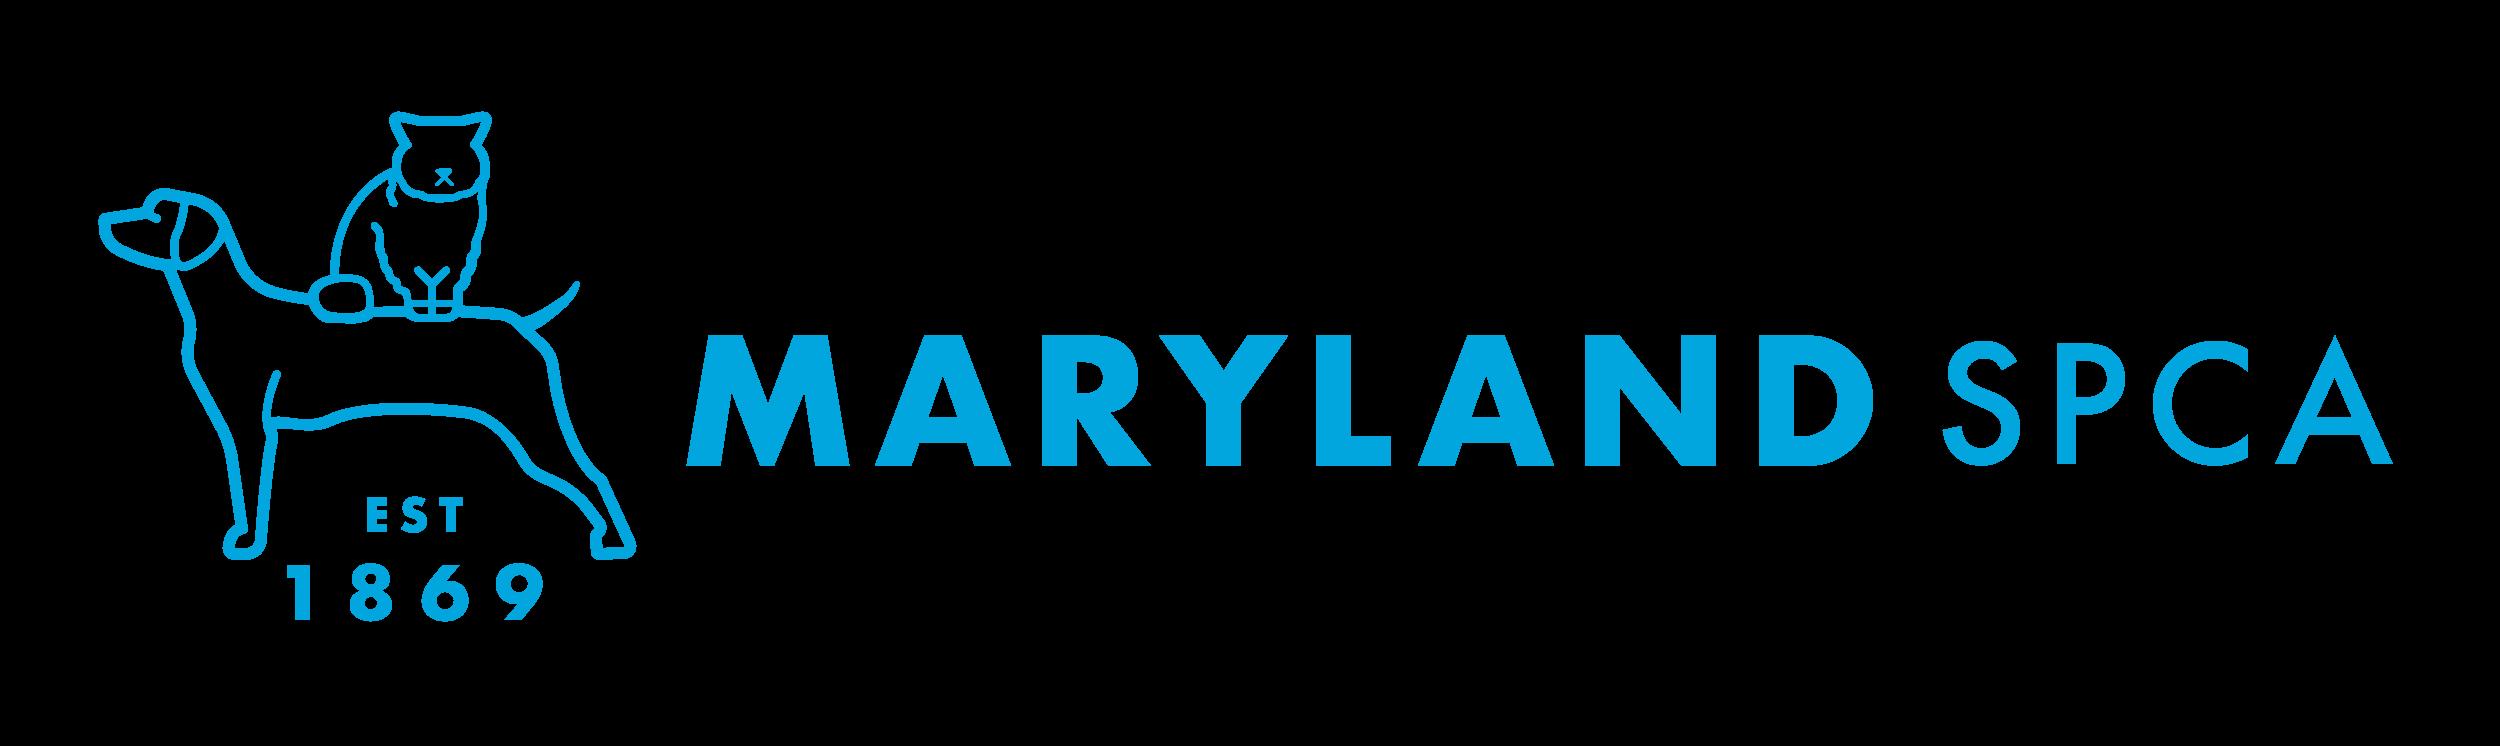 Maryland SPCA logo